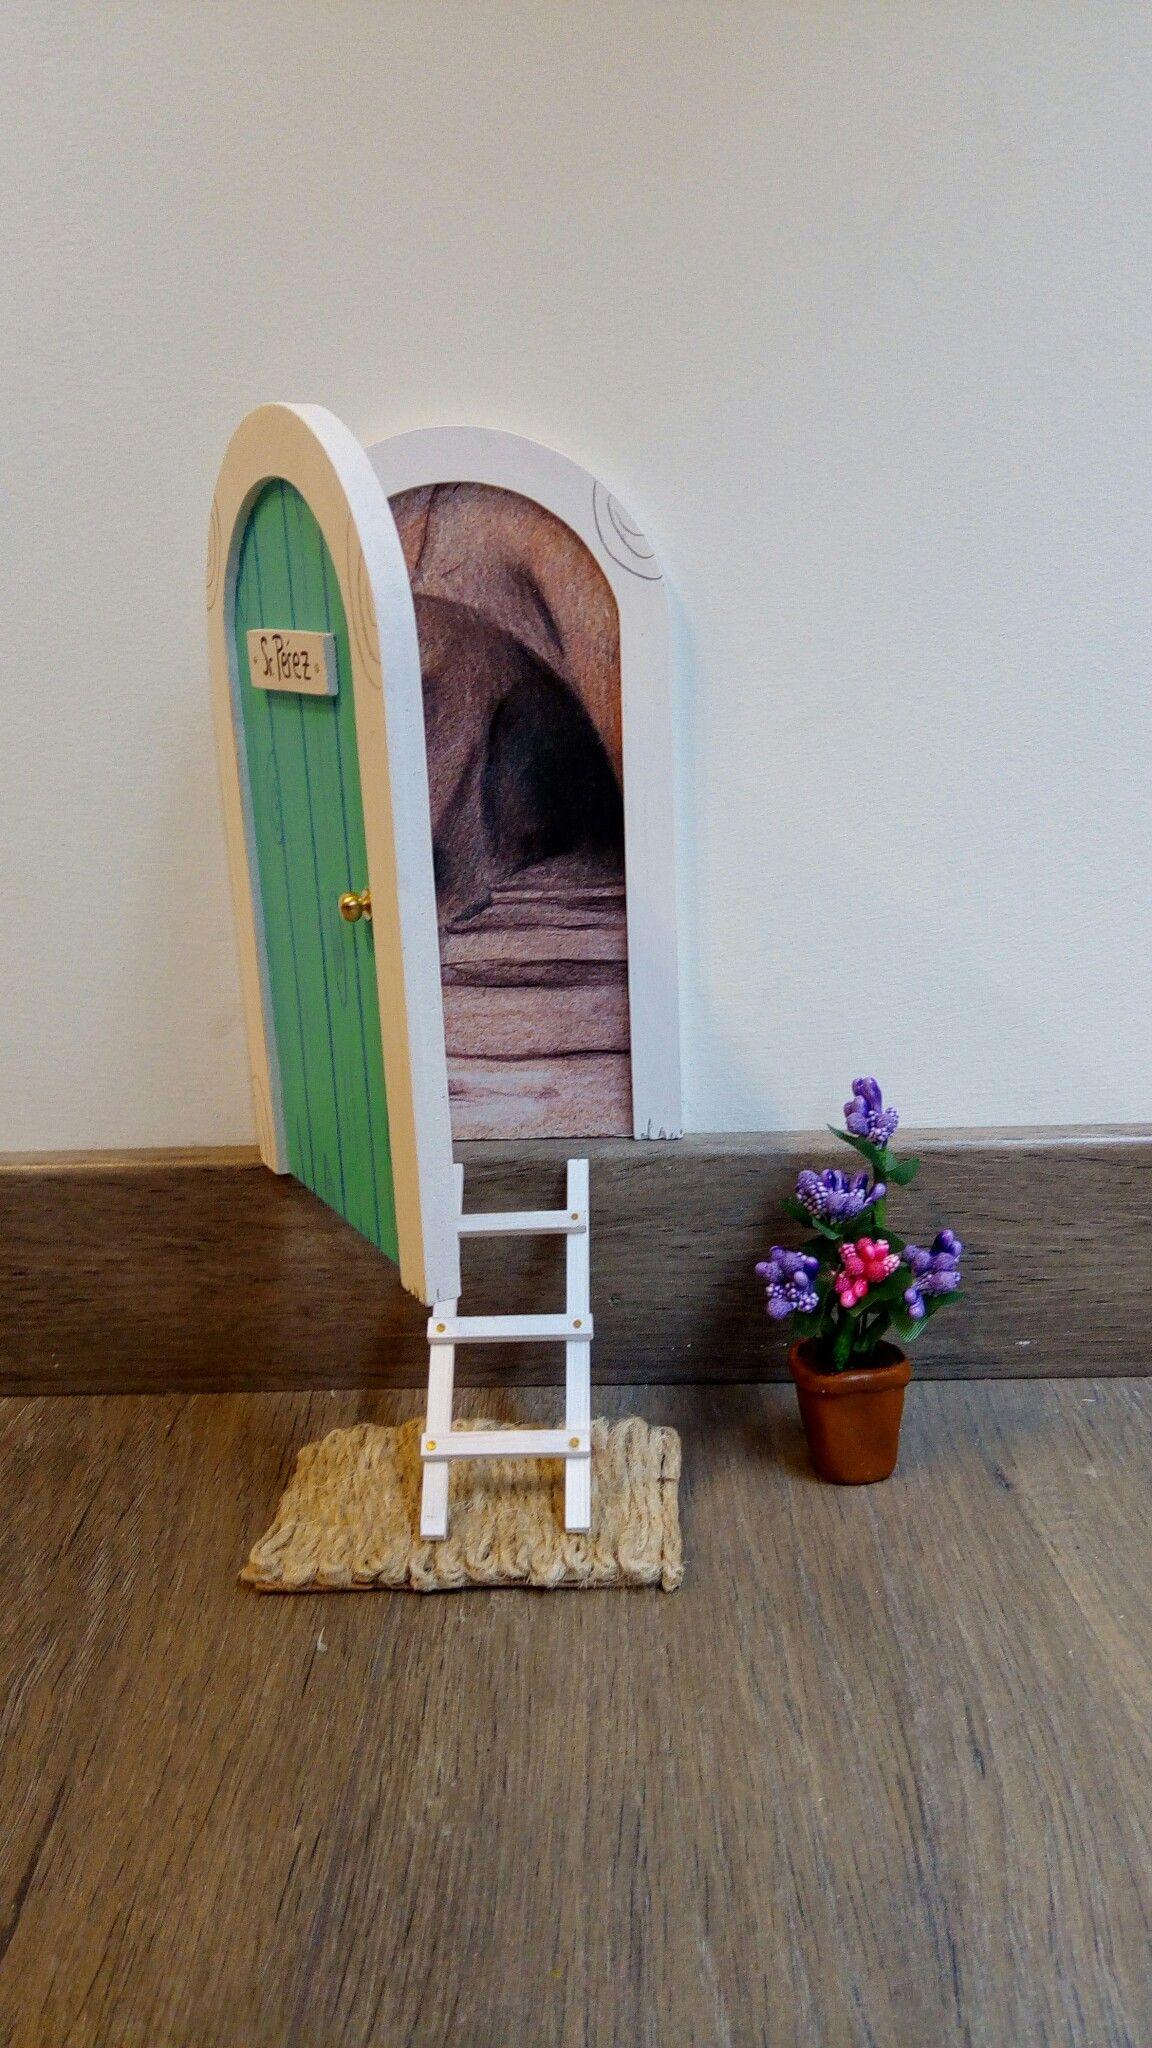 La original puerta del ratoncito  Pérez por La iluminista